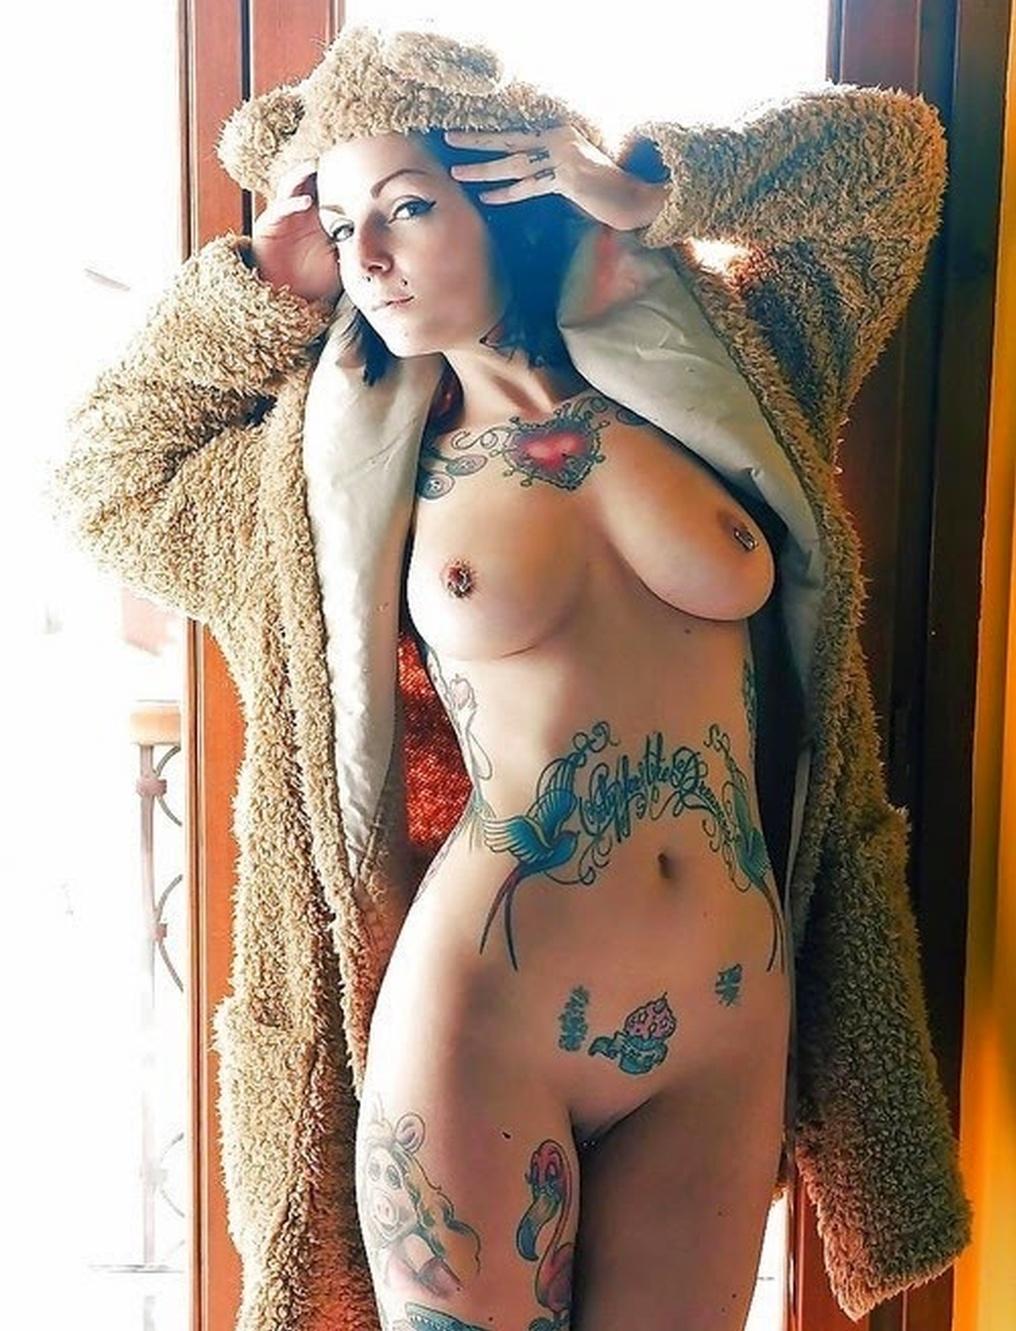 Nude free punk women nudes rough